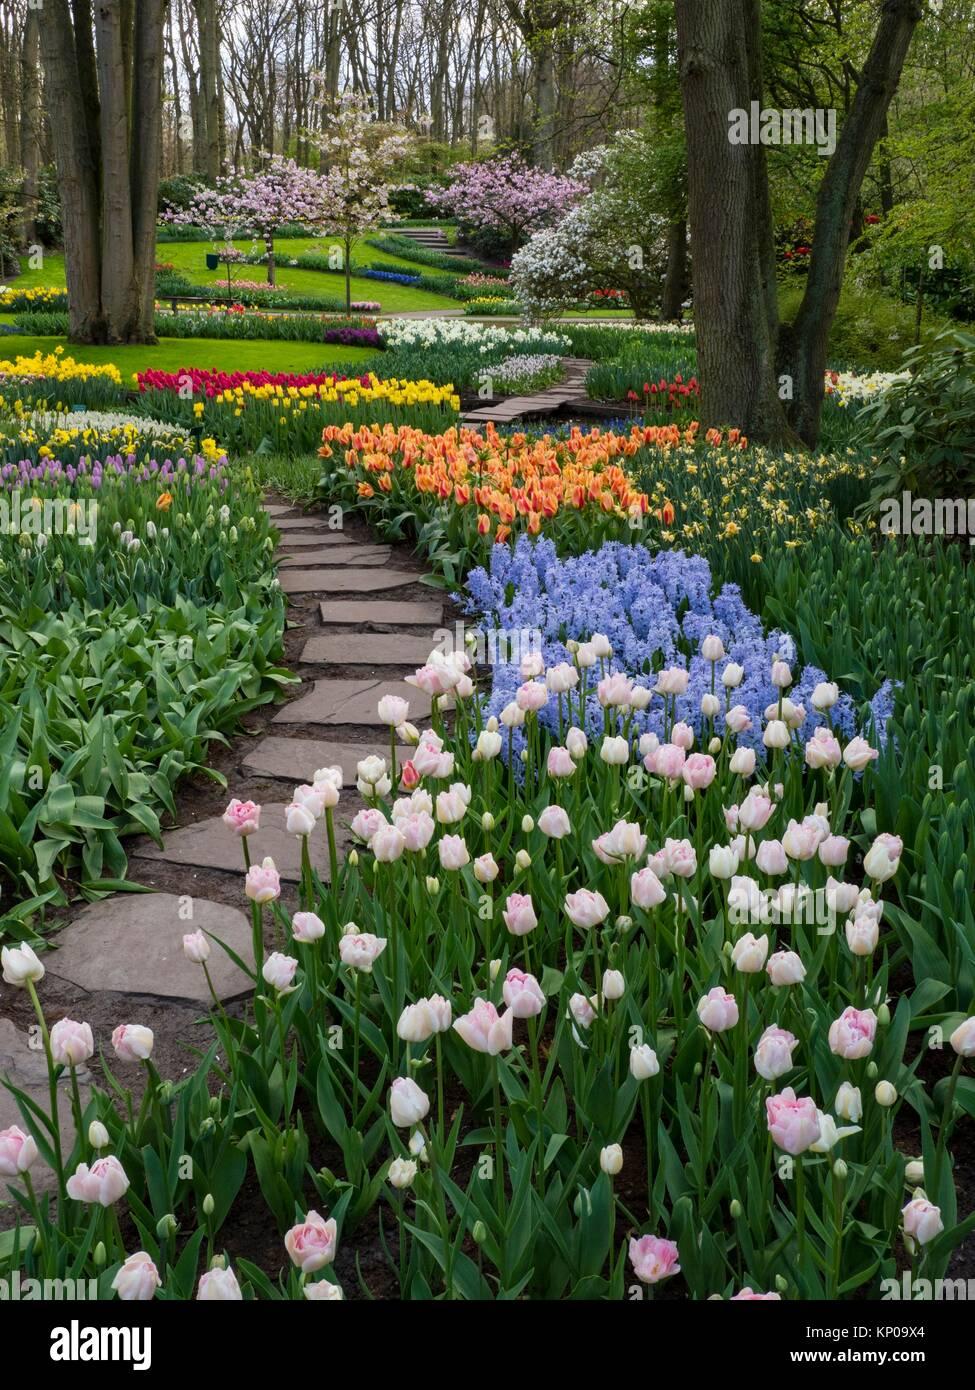 Holland Keukenhof Gardens. - Stock Image